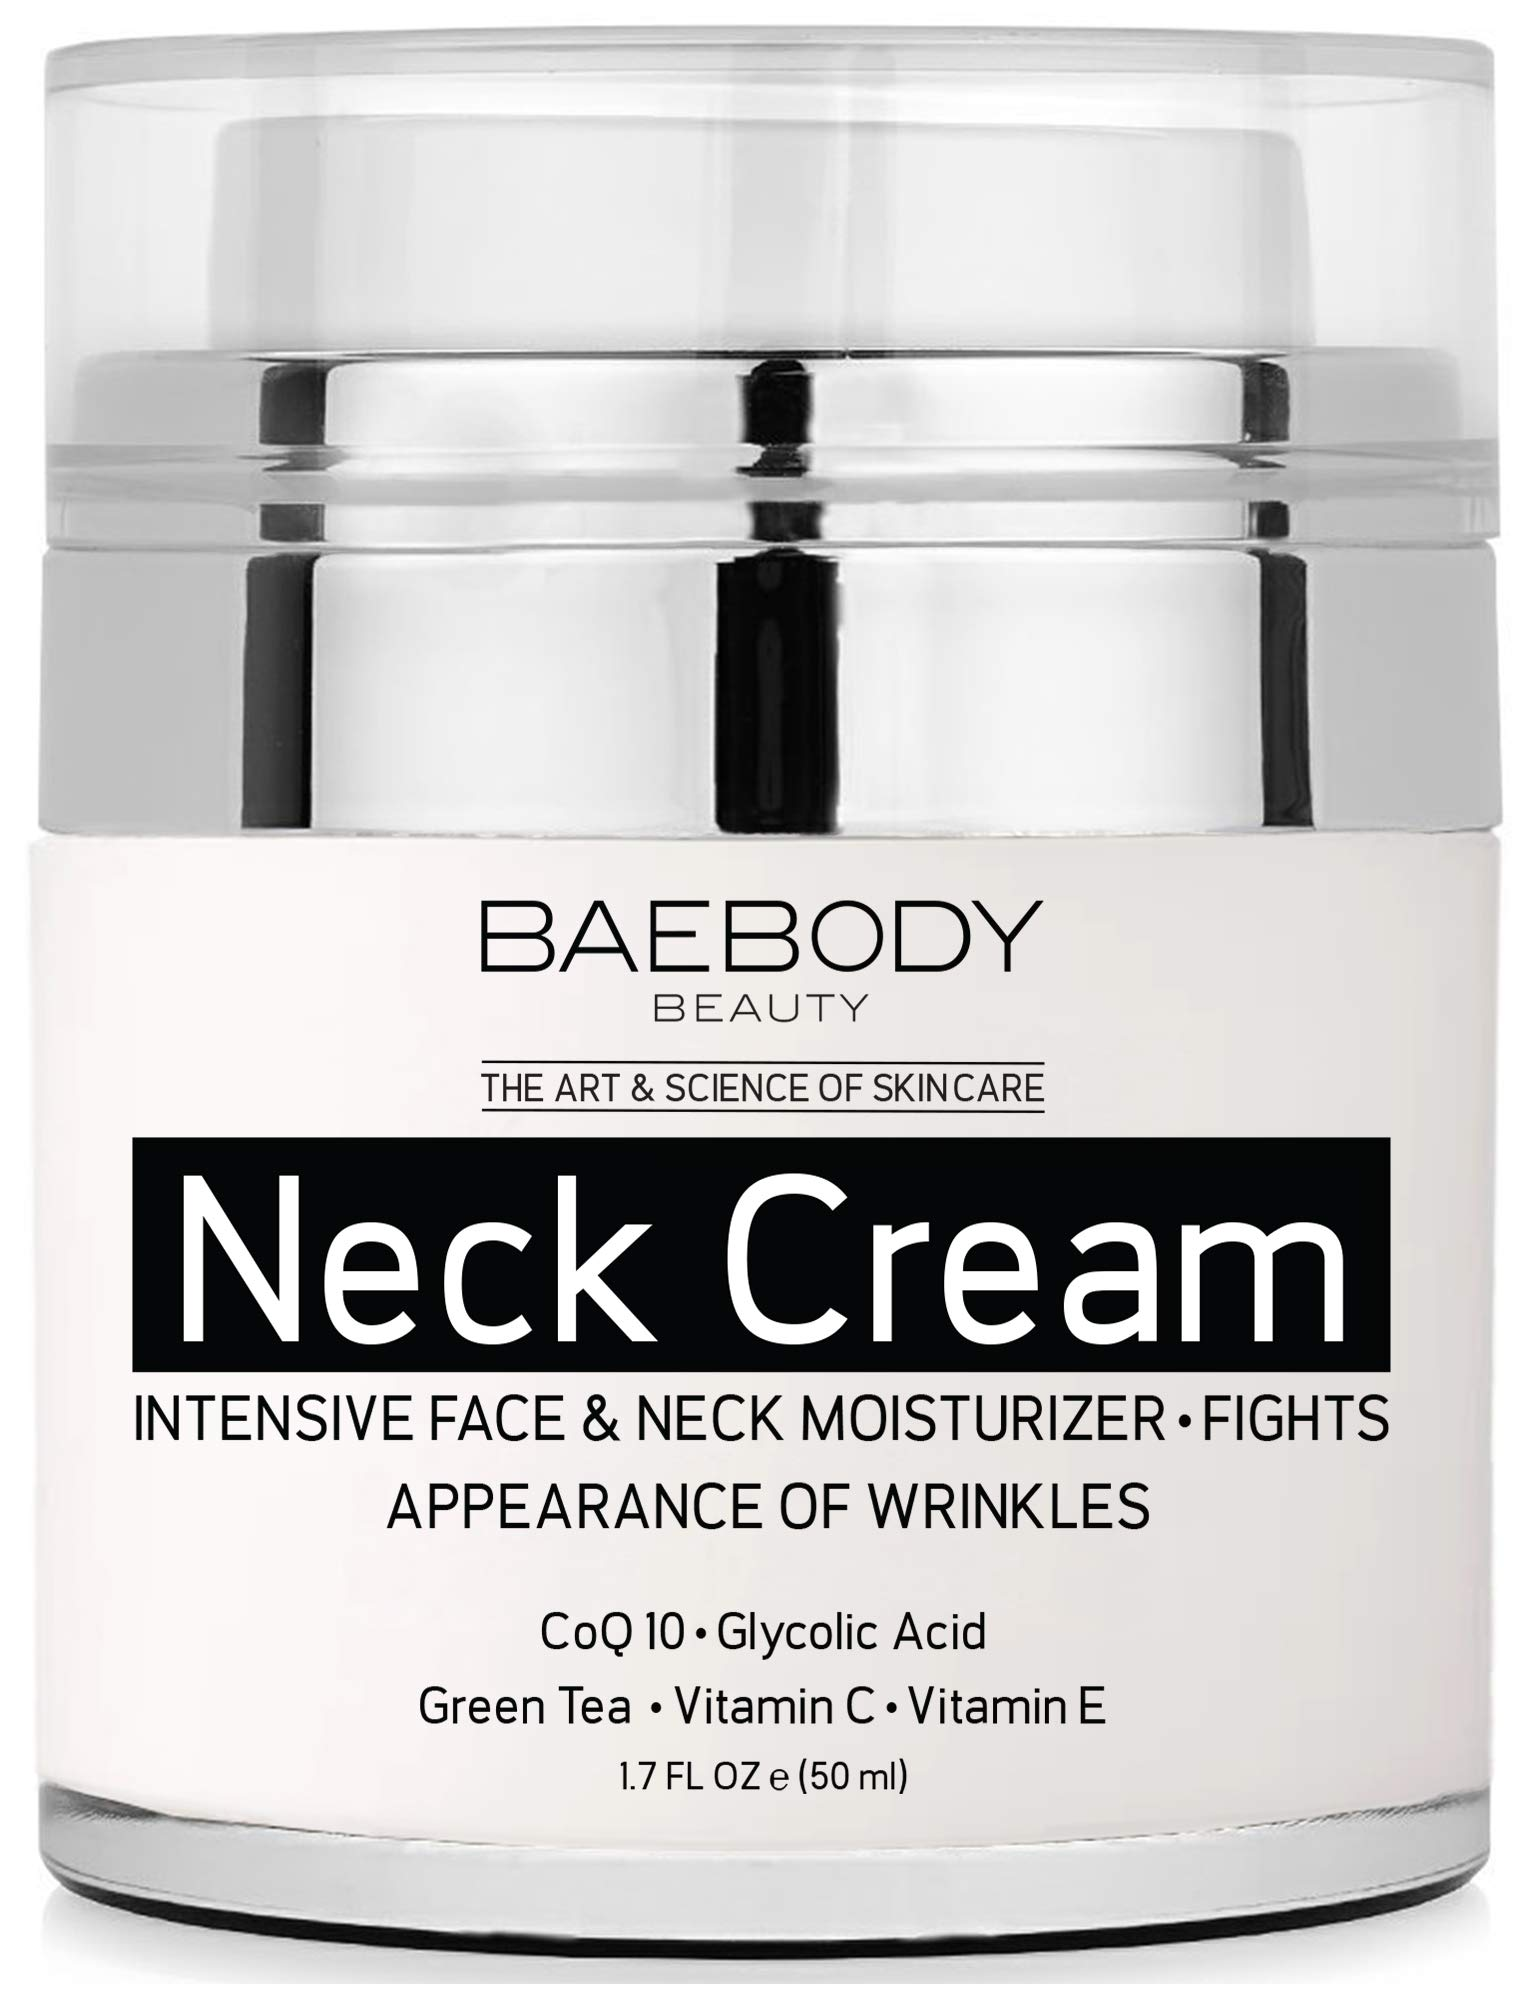 Baebody Neck Cream with AHAs, CoQ10, Glycolic Acid & Green Tea, 1.7 Ounces